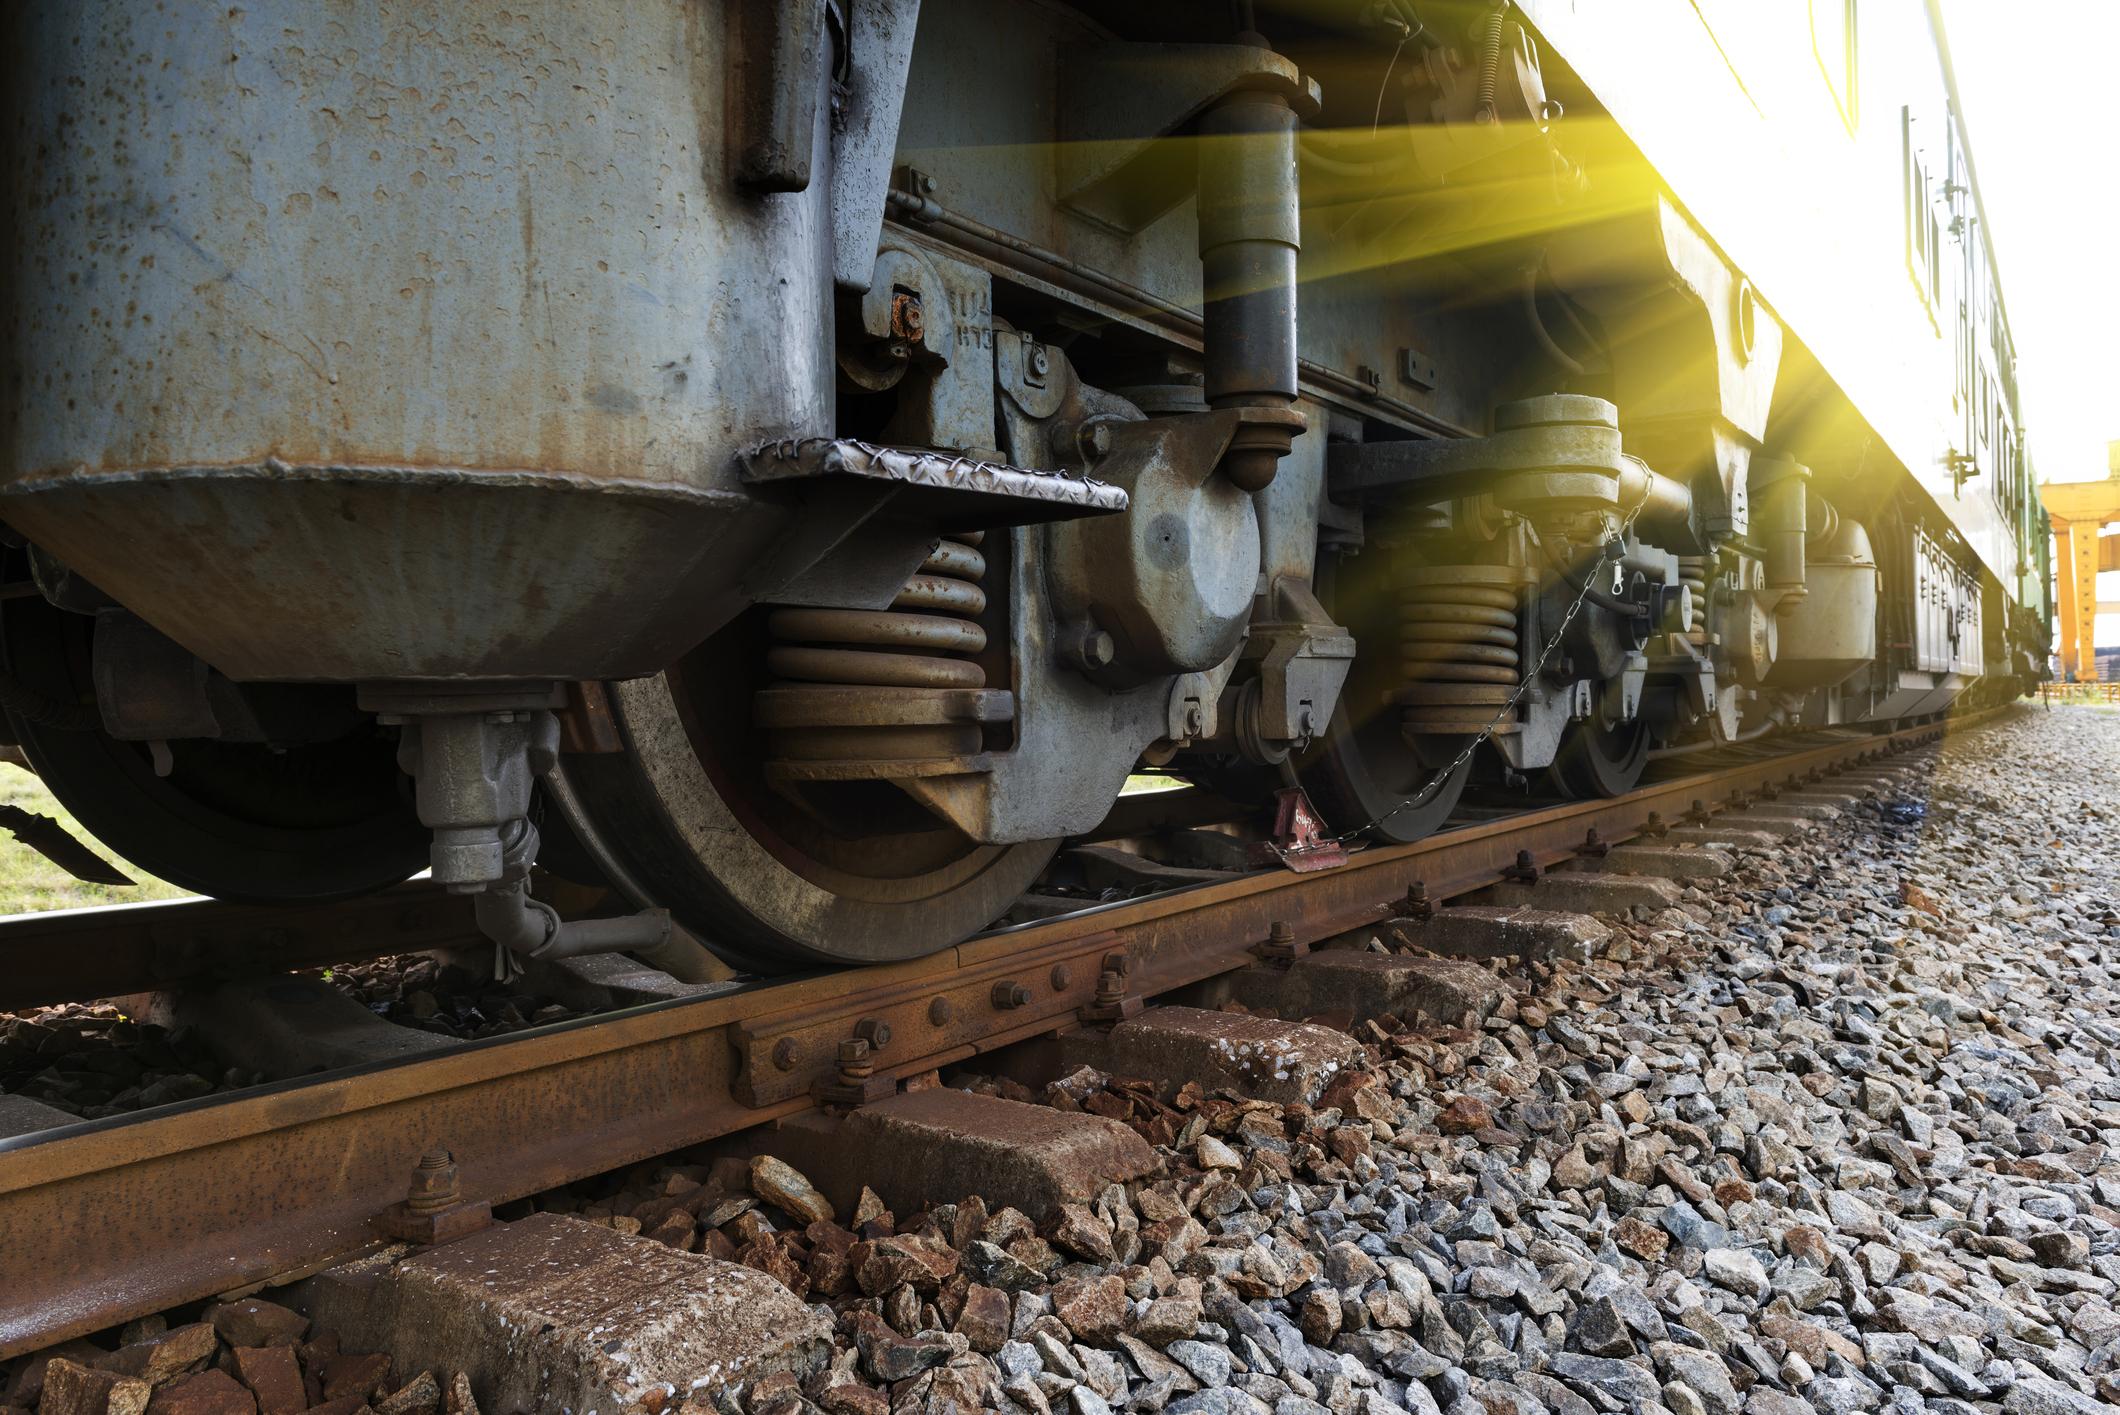 Train wheel on a track.